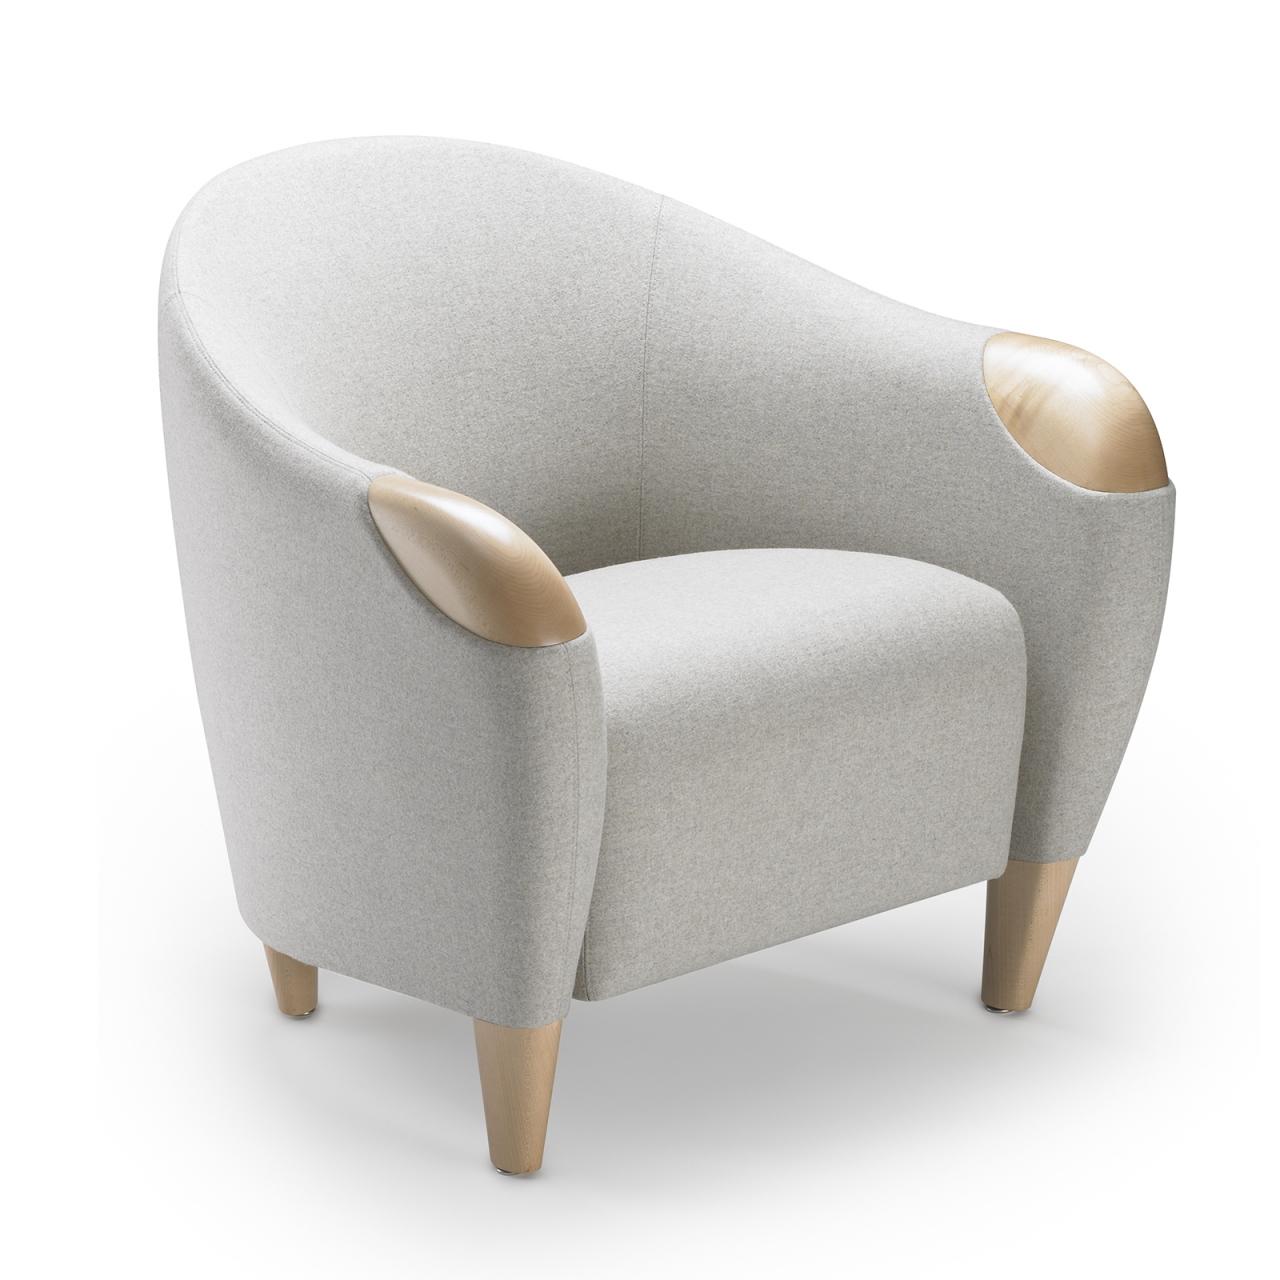 Lounge Fauteuil Houston.Nemschoff Florrabella Healthcare Furniture Lounge